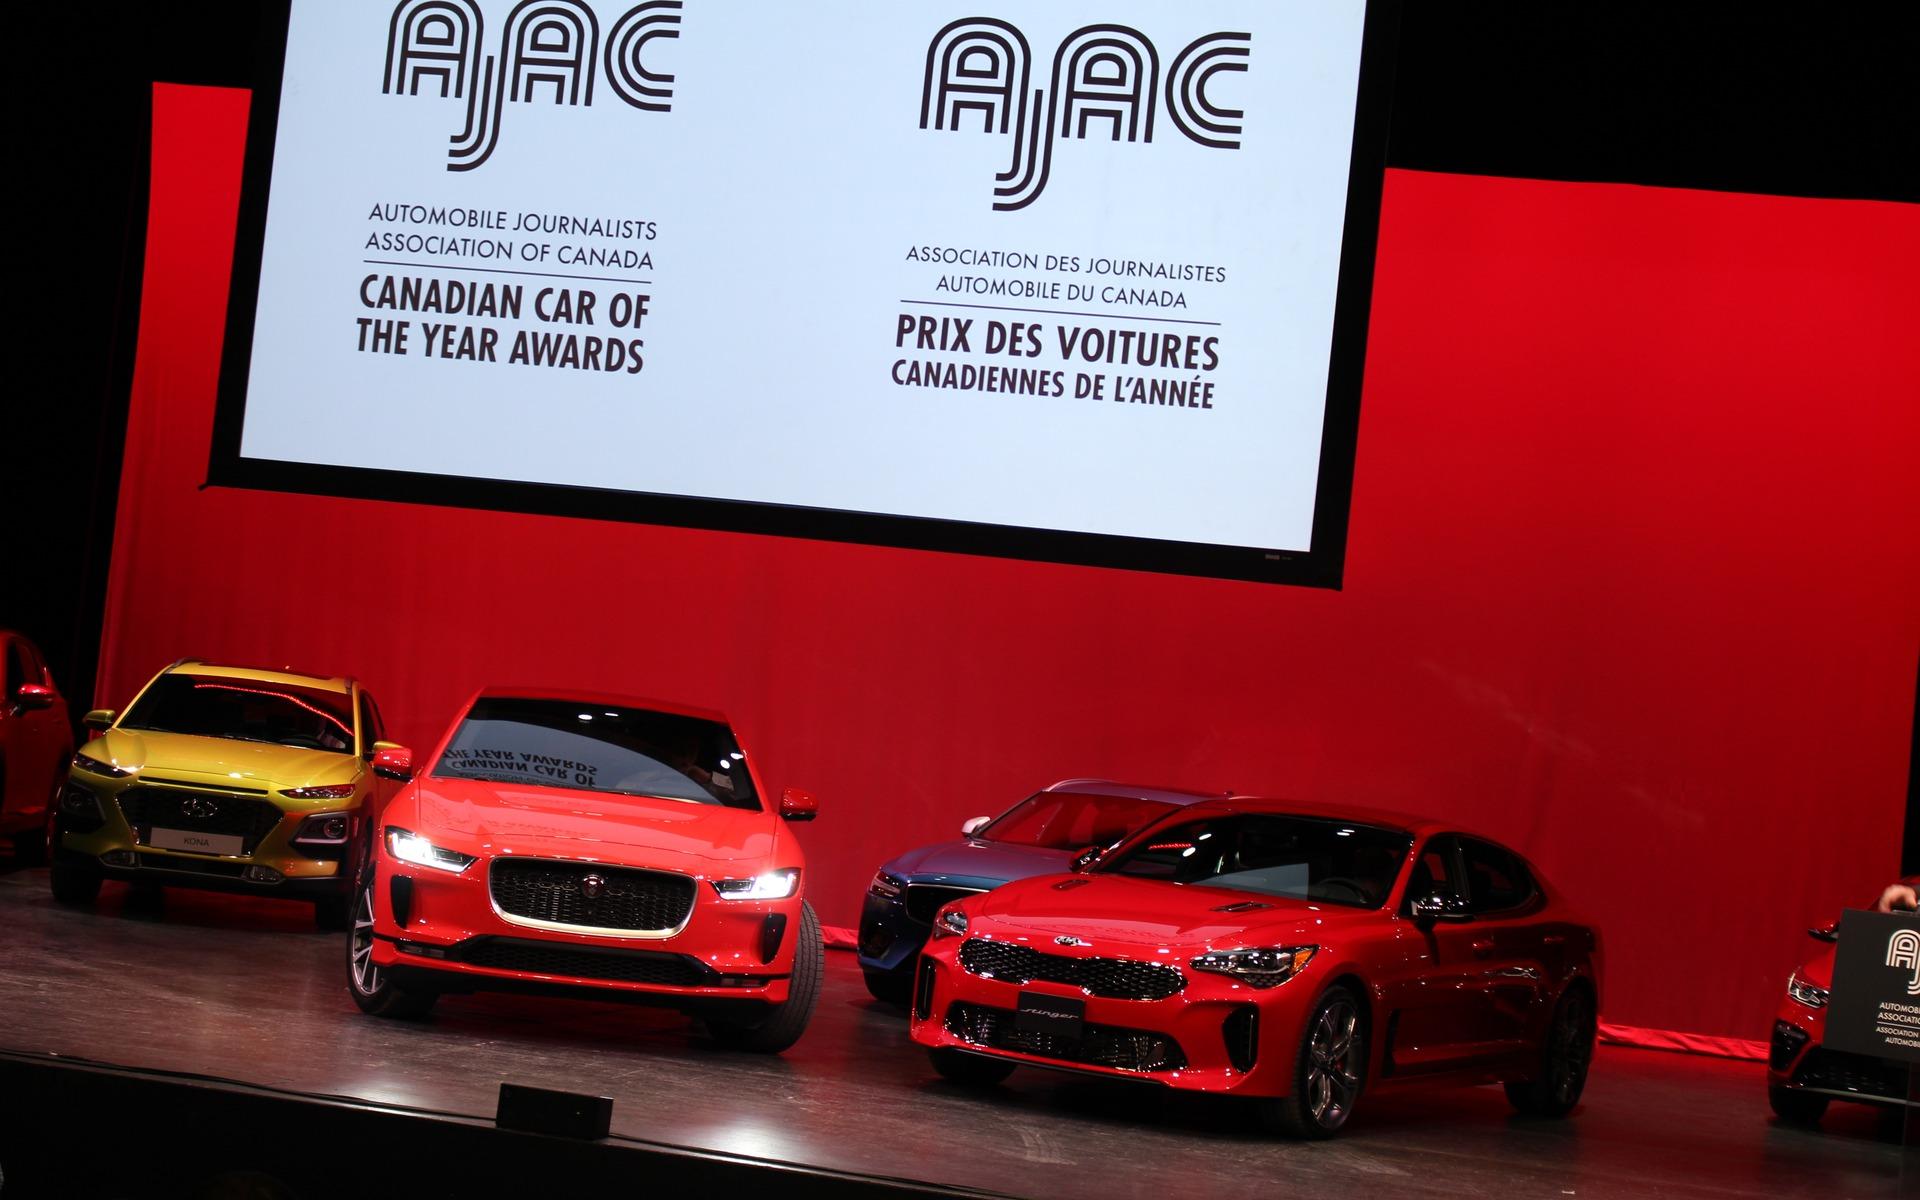 Kia Stinger and Jaguar I-PACE Win AJAC's 2019 Canadian Car